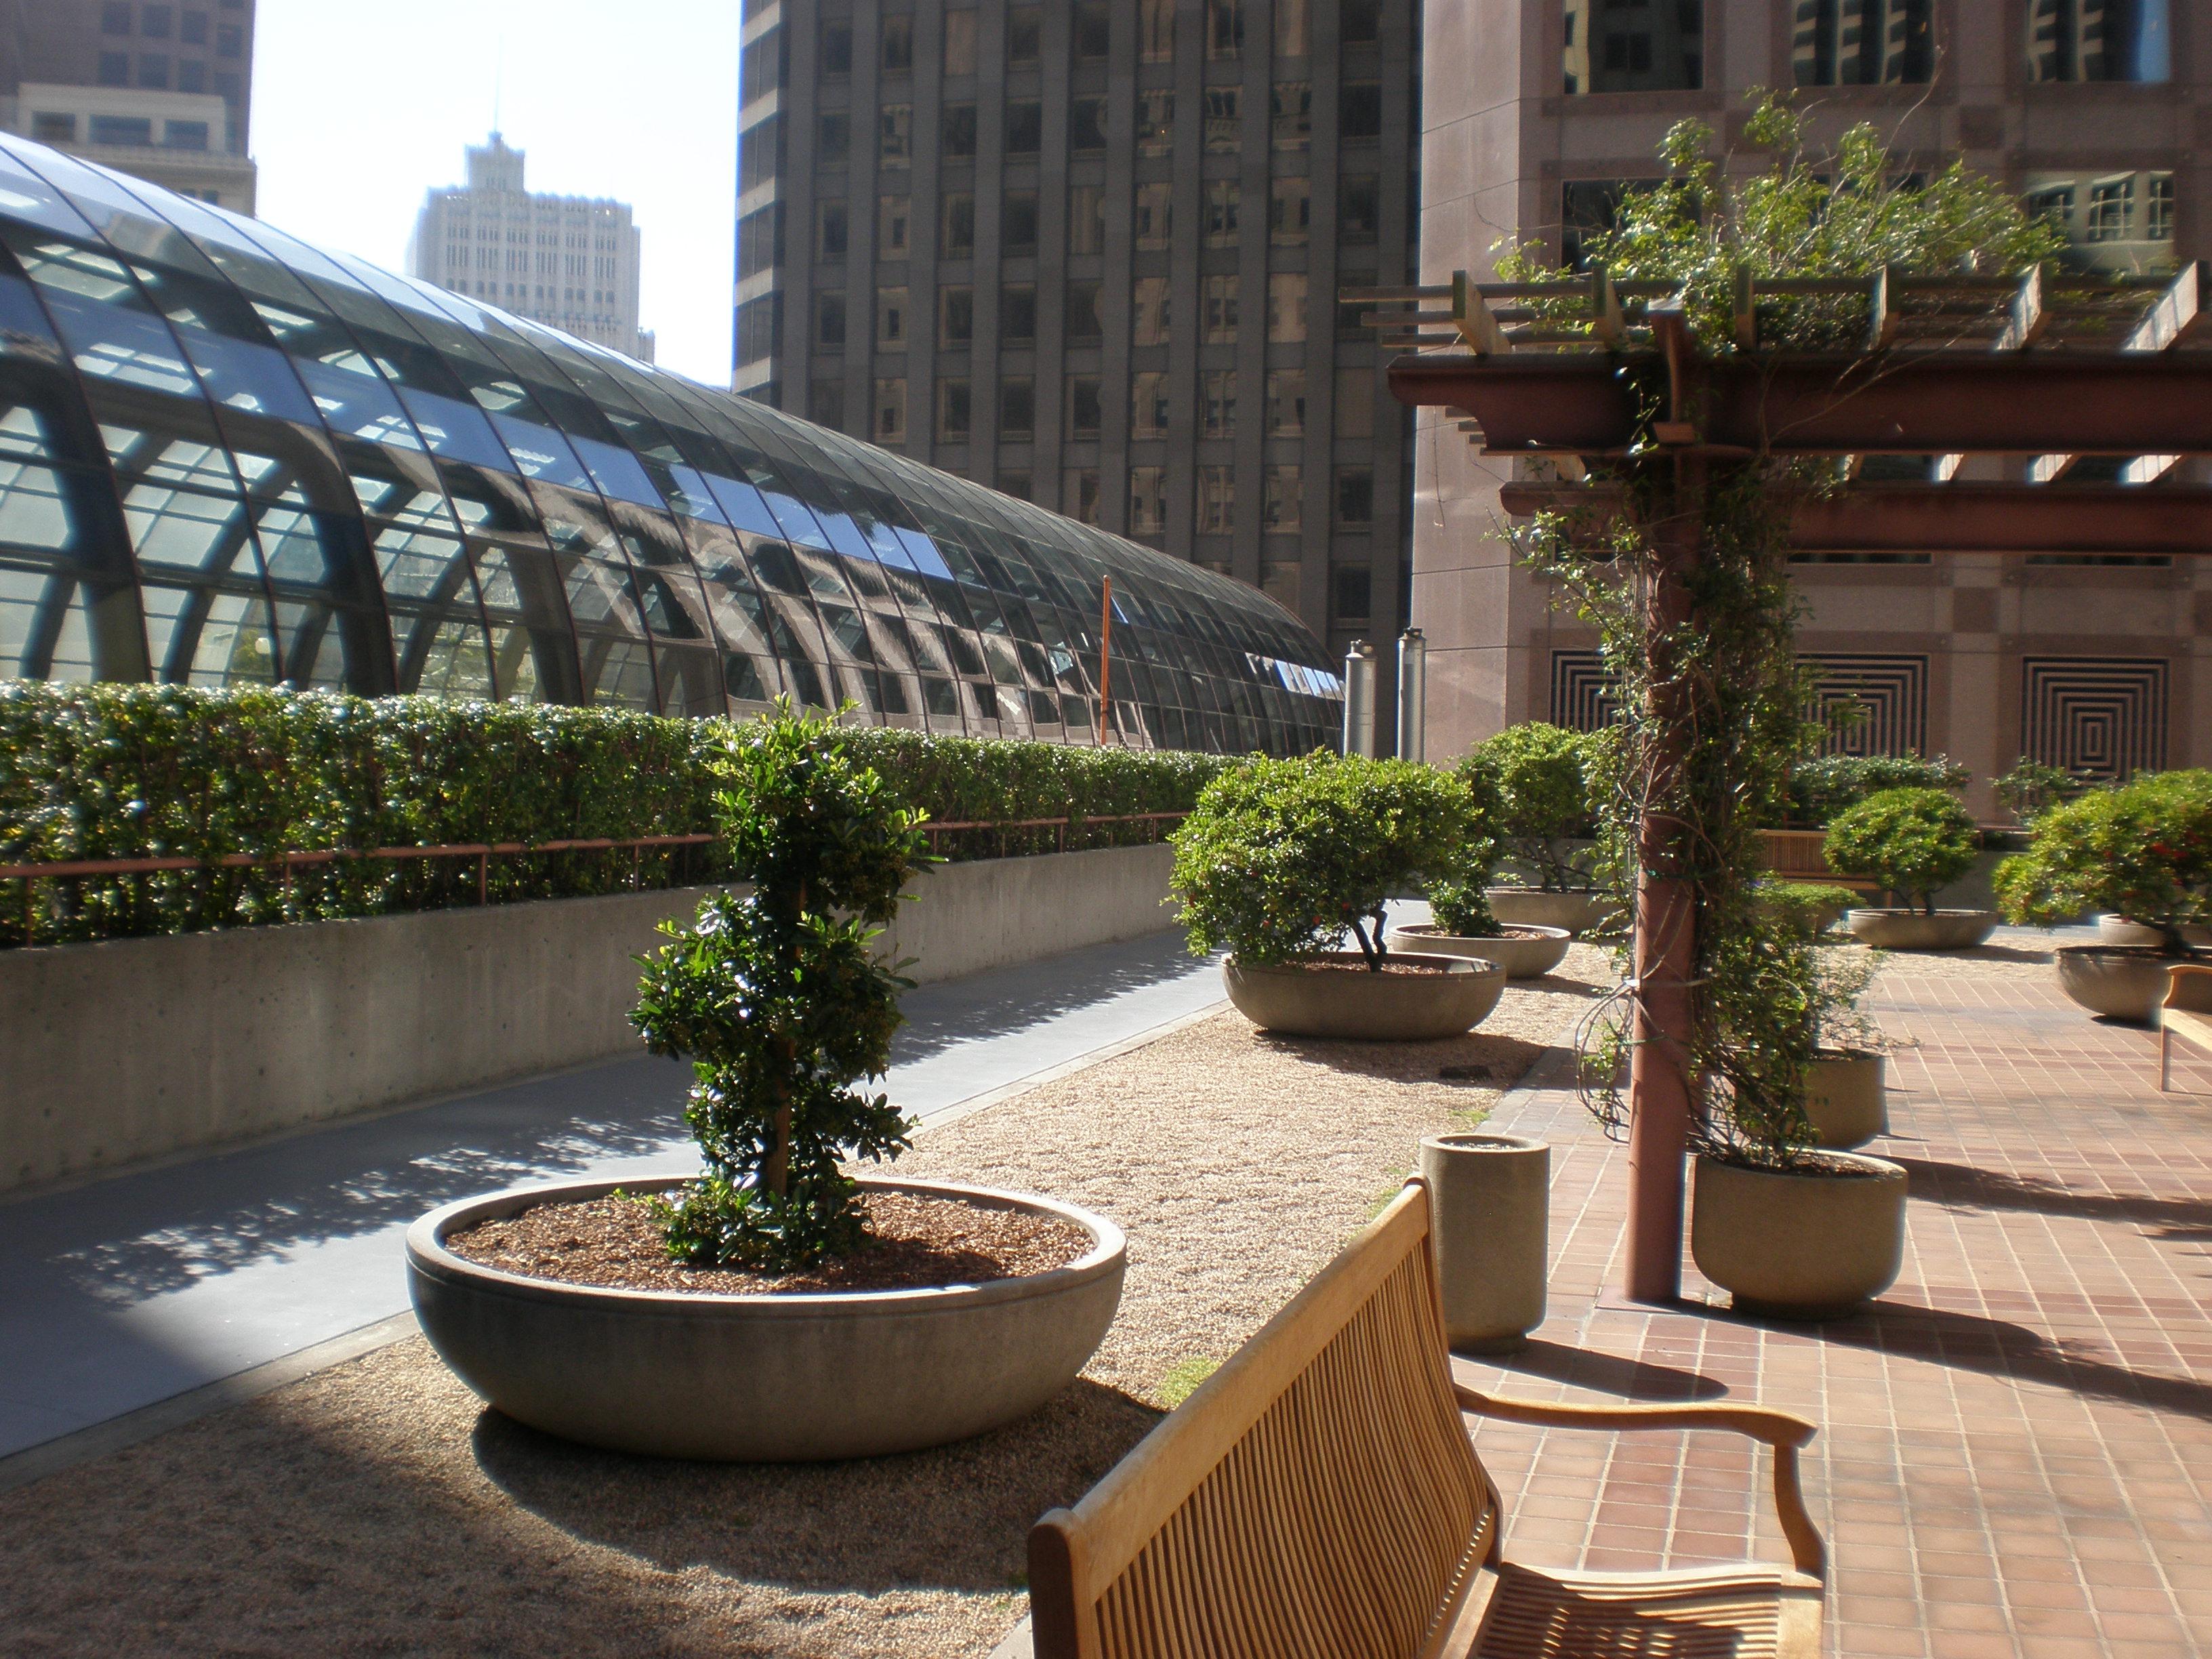 File:1 Montgomery St. Roof Garden 1.JPG